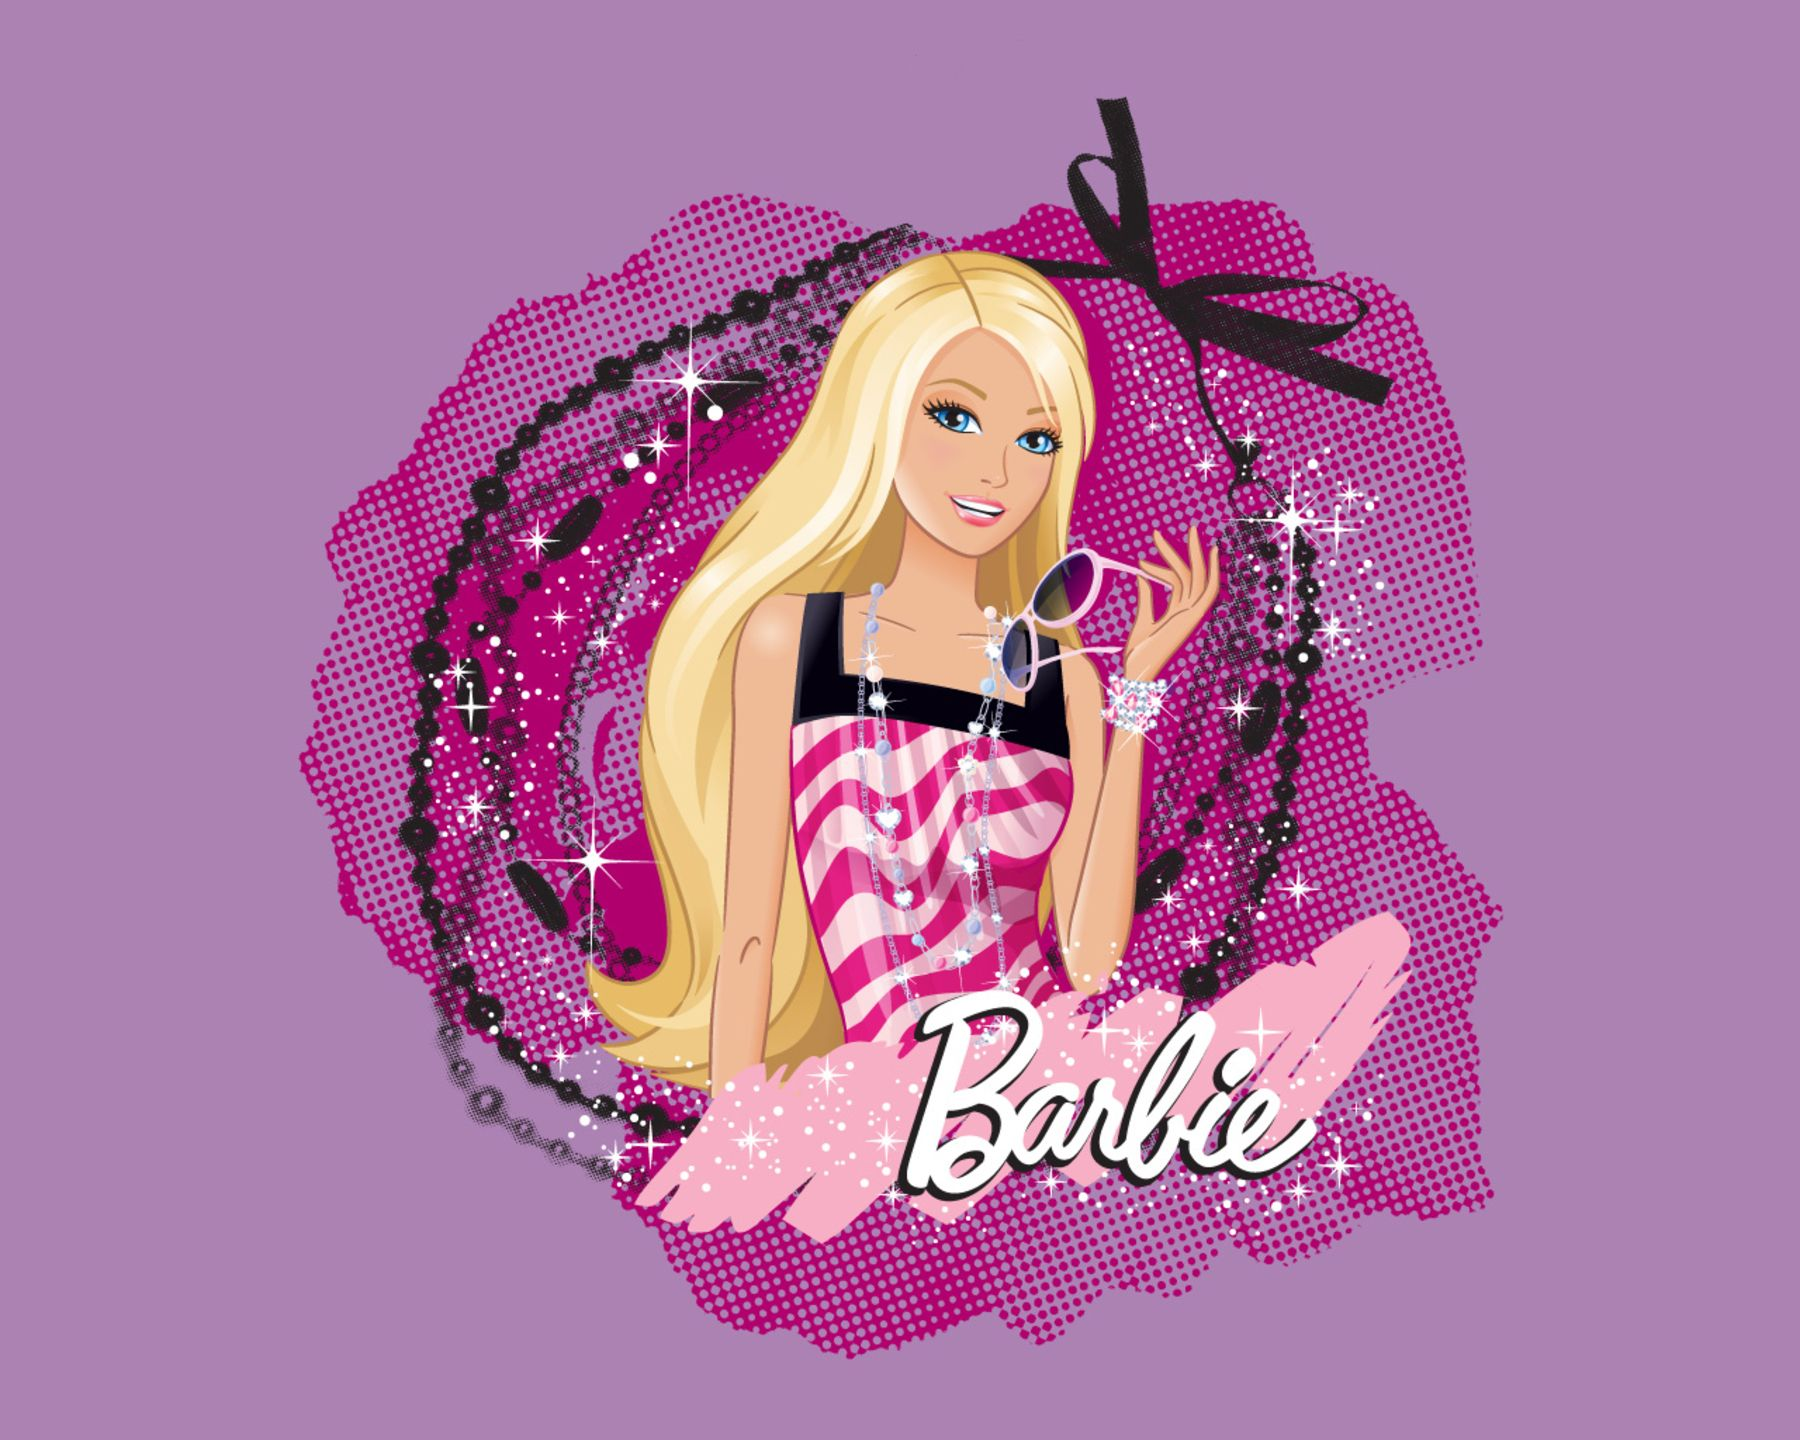 Barbie cartoon barbie cartoon wallpaper hd barbie friends hd wallpaper and background photos of barbie for fans of barbie images voltagebd Images